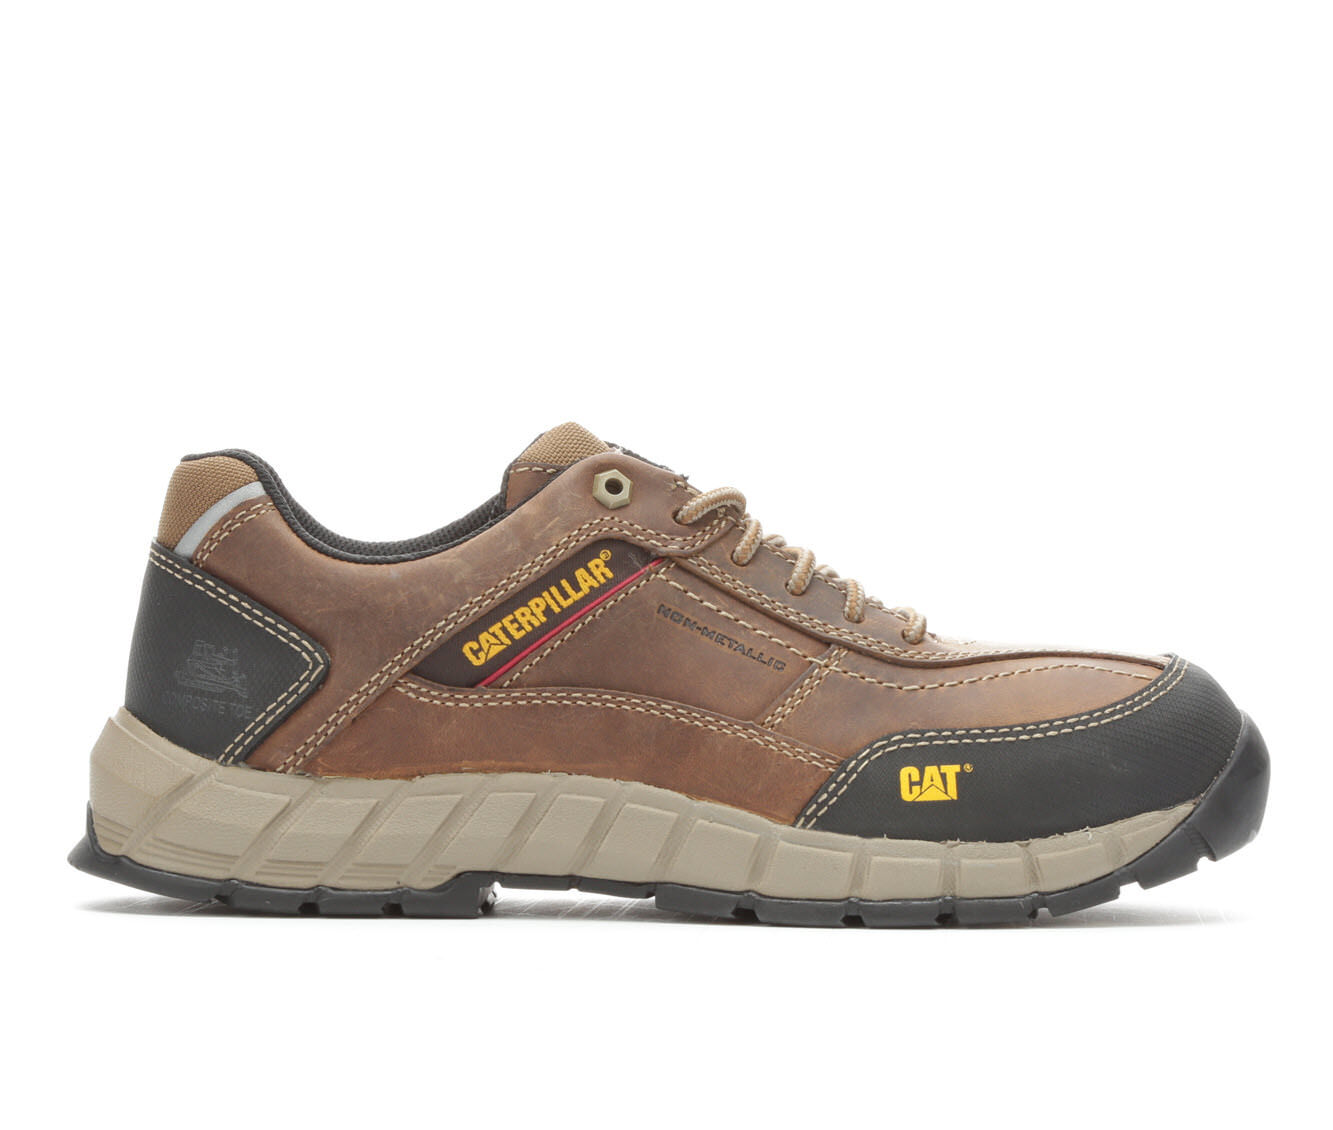 Outdoor Sports Men's Caterpillar Streamline Leather Composite Toe Work Shoes Dark Beige